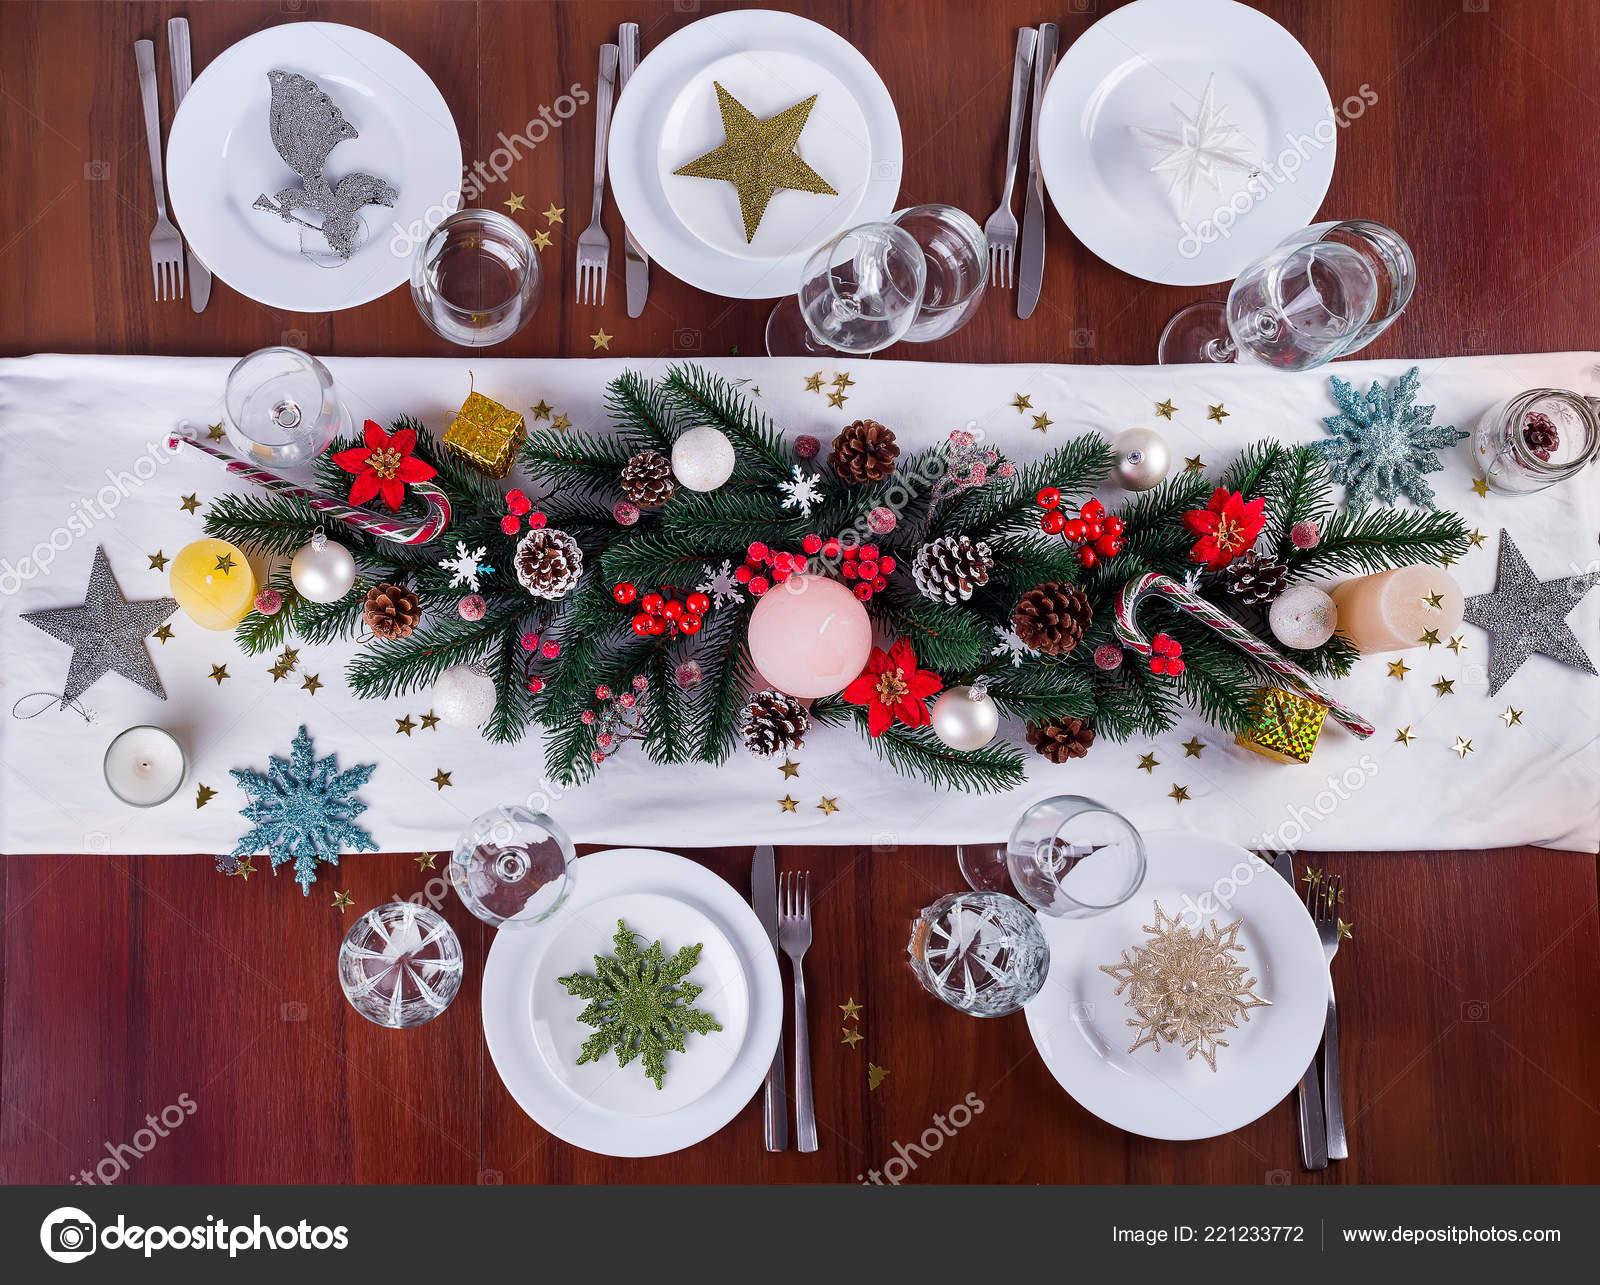 A Christmas Arrangement.Decorates A Christmas Arrangement With Candles Christmas